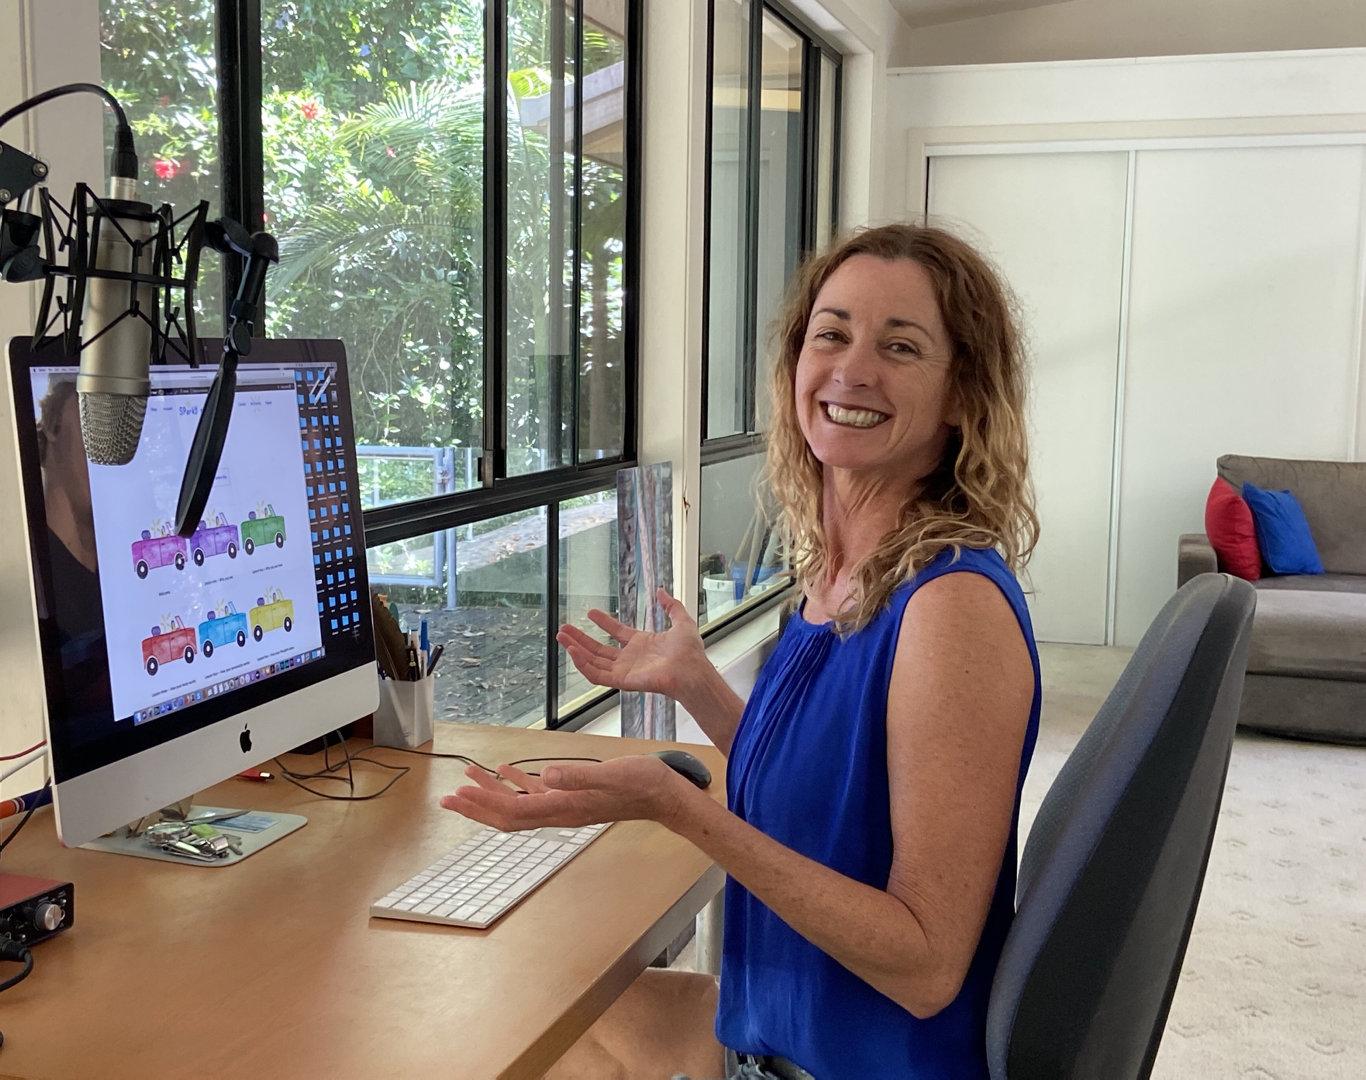 Online teacher Kathy Sheehan